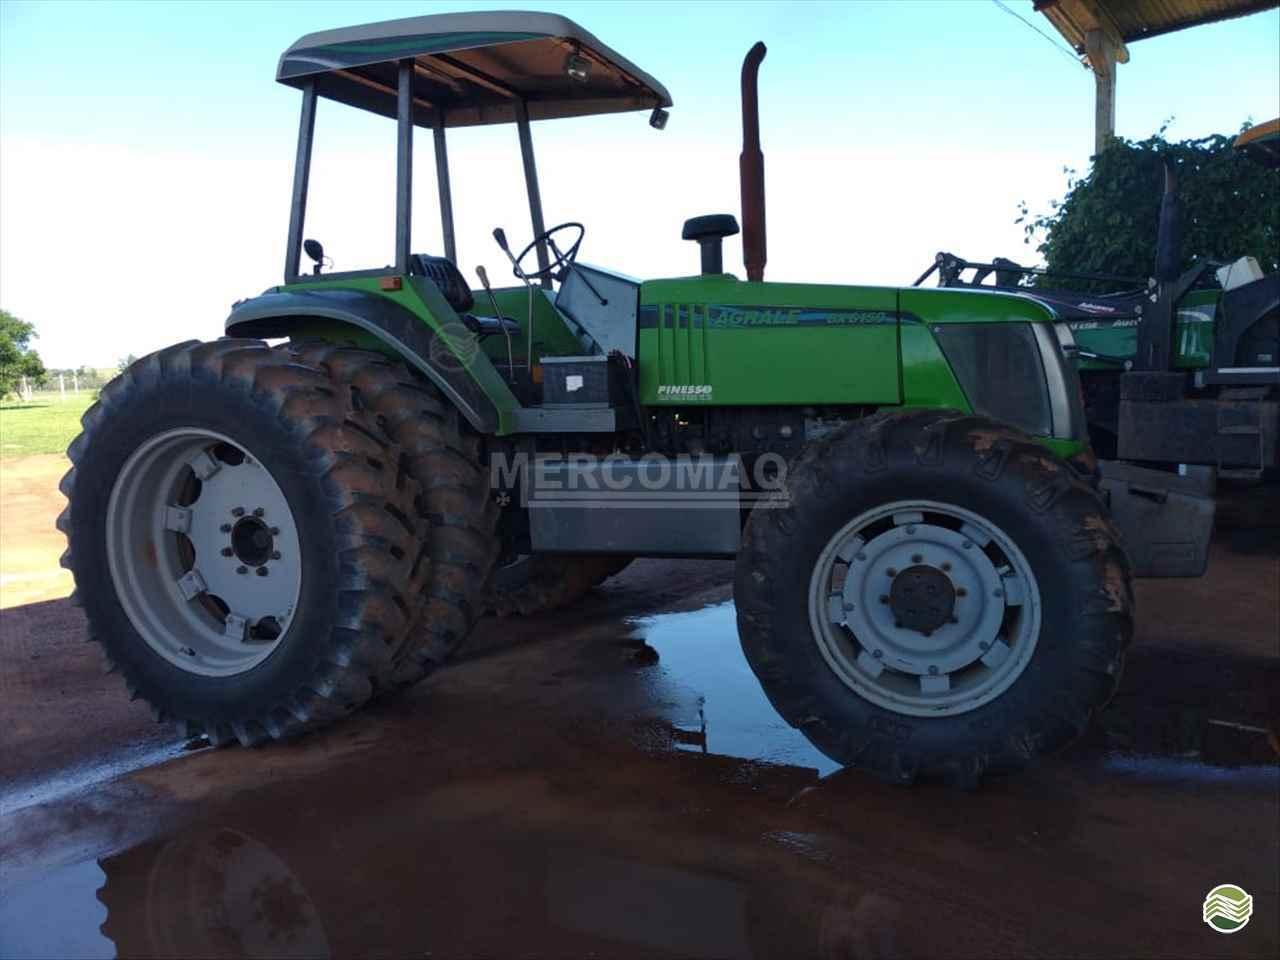 TRATOR AGRALE AGRALE BX 6150 Tração 4x4 Mercomaq - JAN - GTS PRIMAVERA DO LESTE MATO GROSSO MT